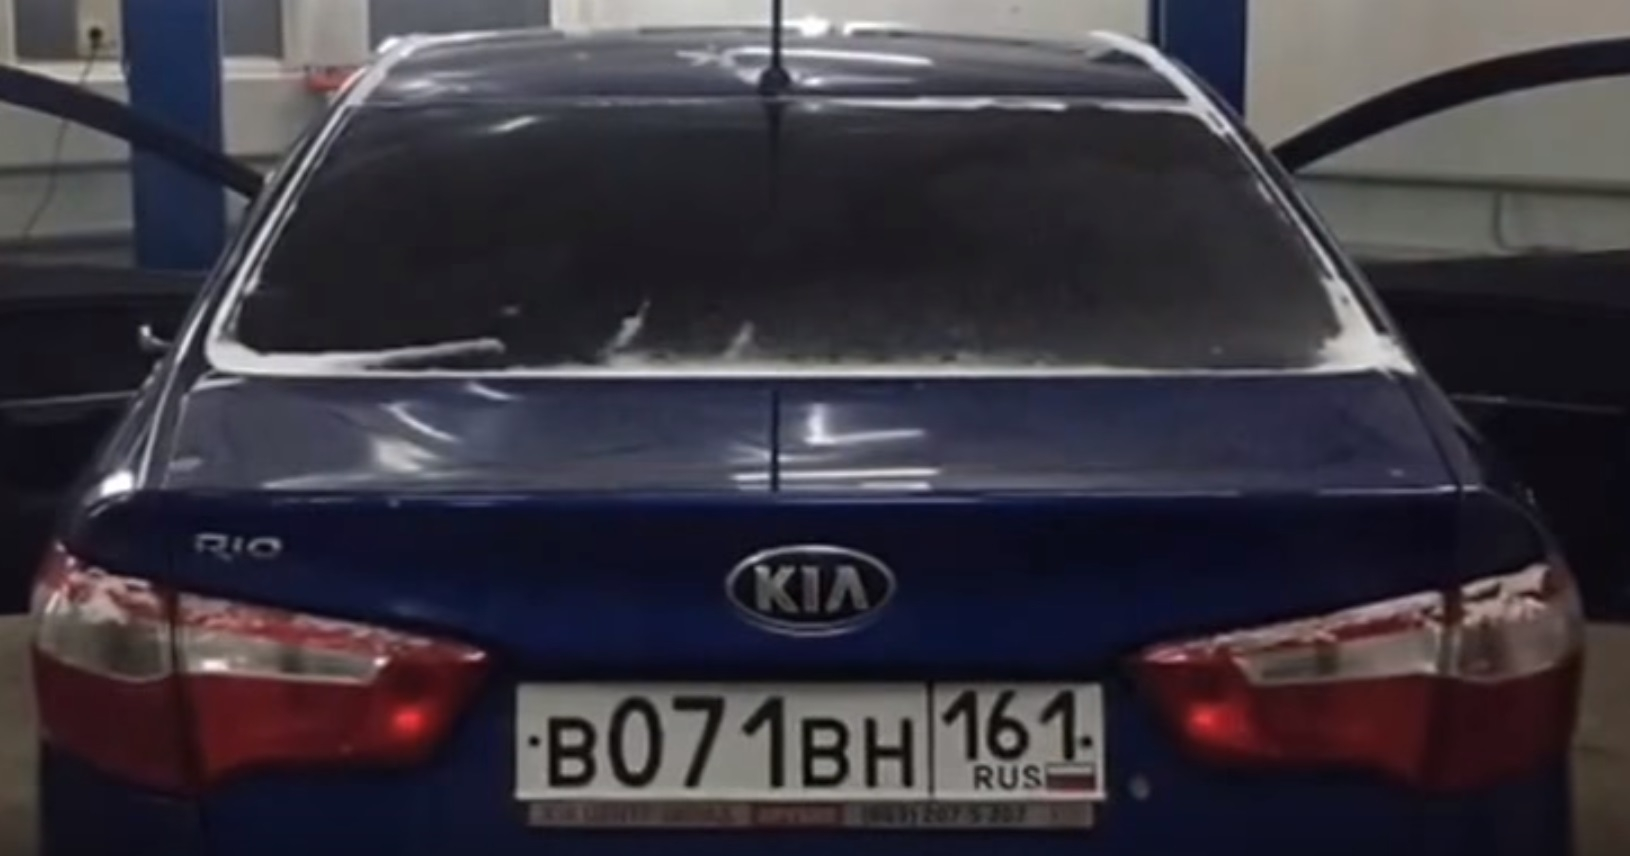 Чип тюнинг KIA Rio 1.4 AT в Ростове на Дону.